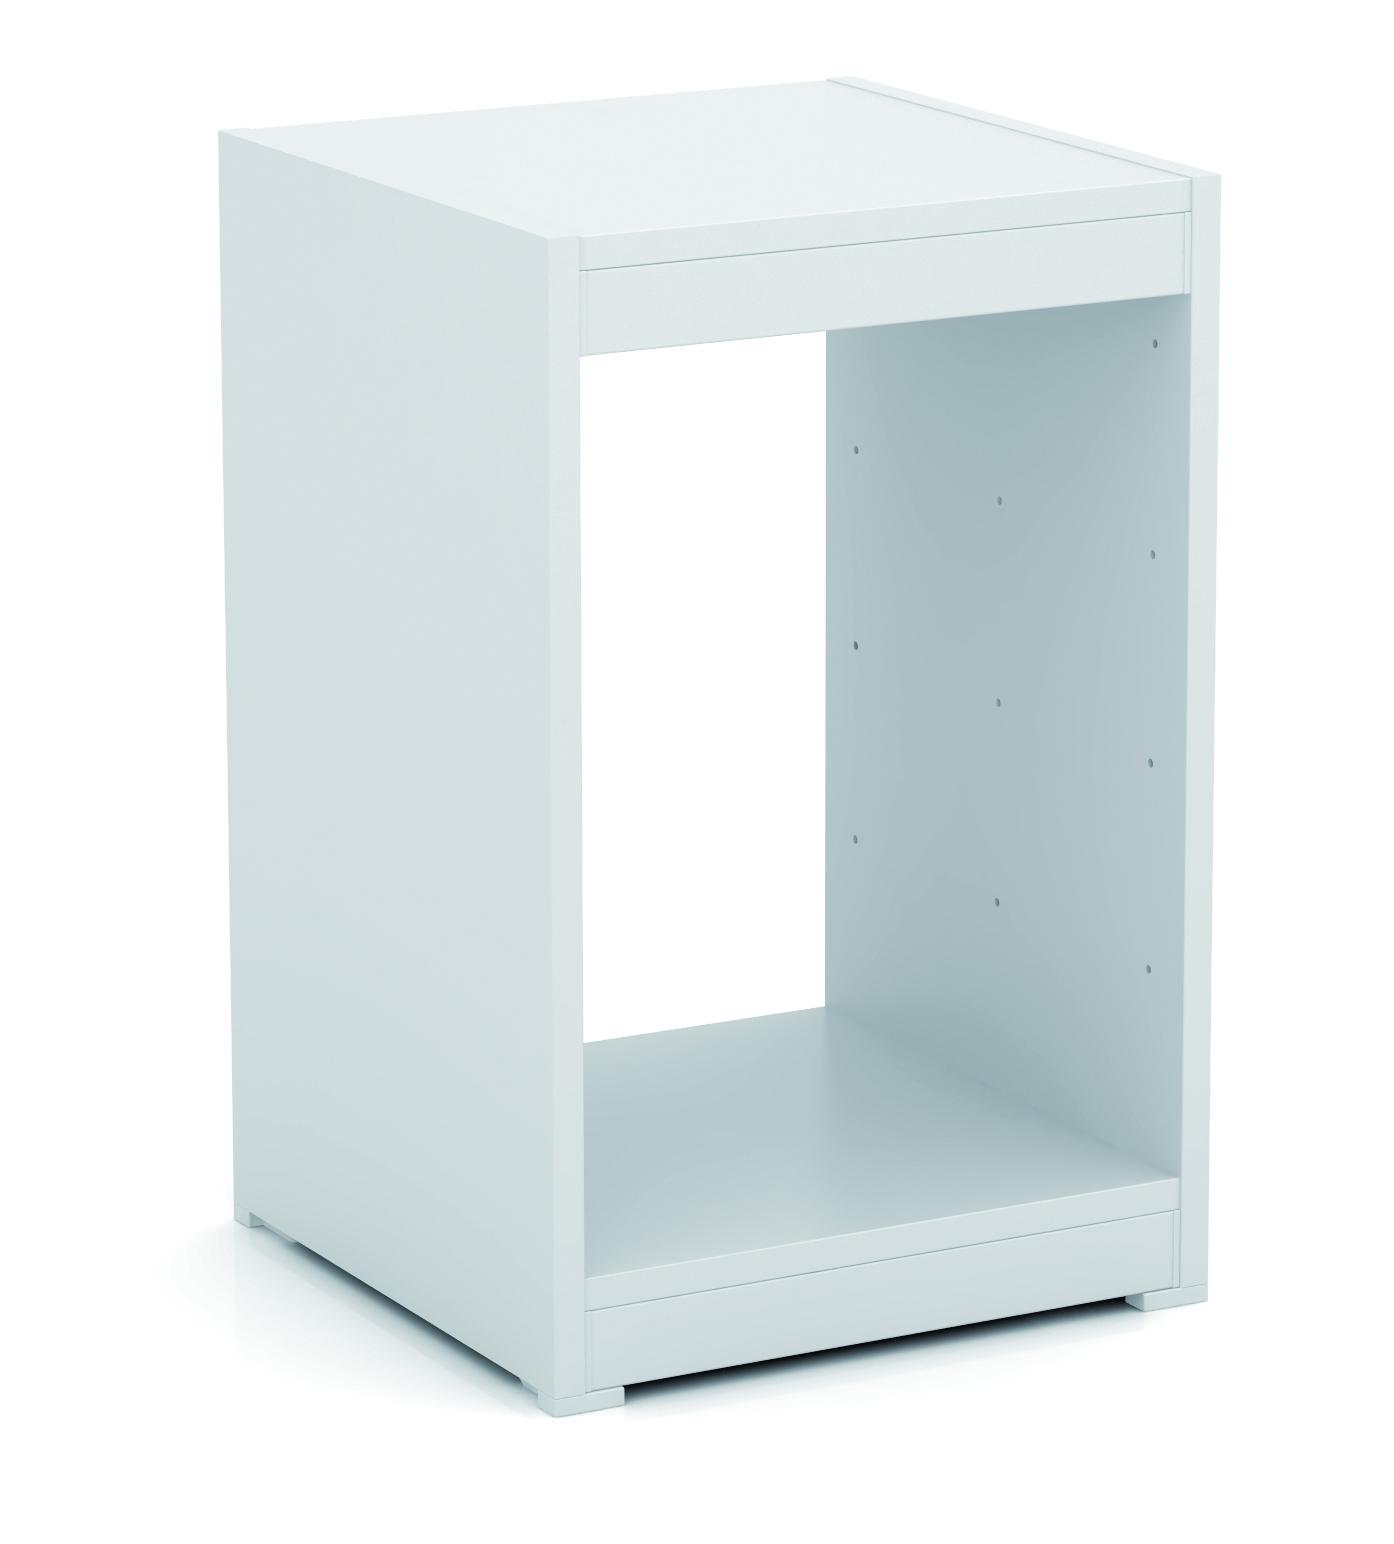 ondis24 kreo regal niedrig g nstig online kaufen. Black Bedroom Furniture Sets. Home Design Ideas